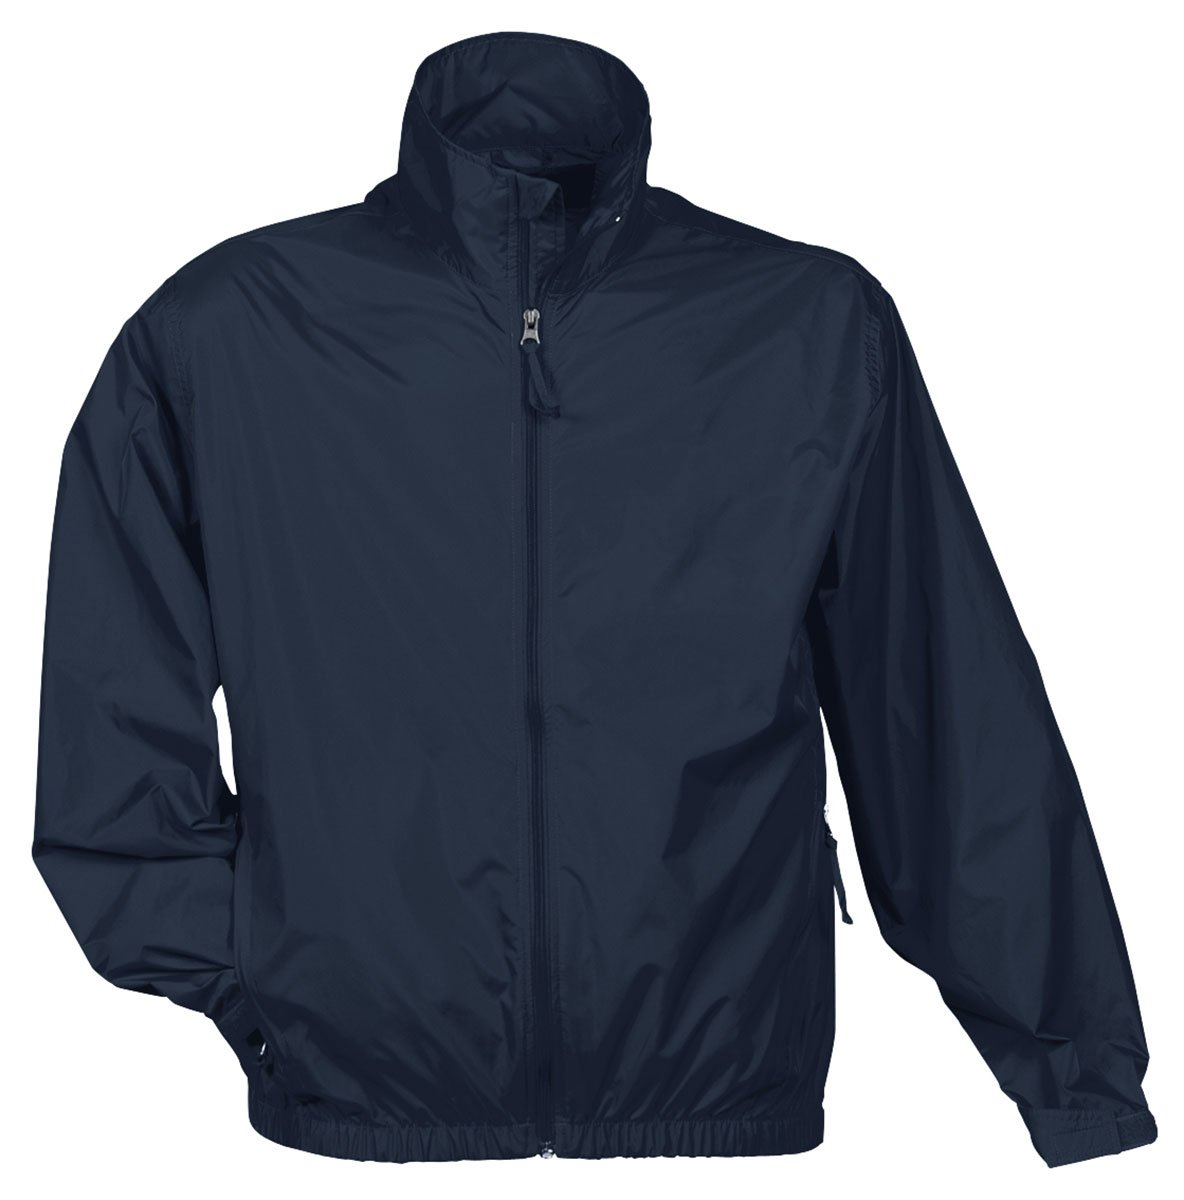 Tri Mountain Men's Lightweight Water Resistant Jacket, Navy, Large